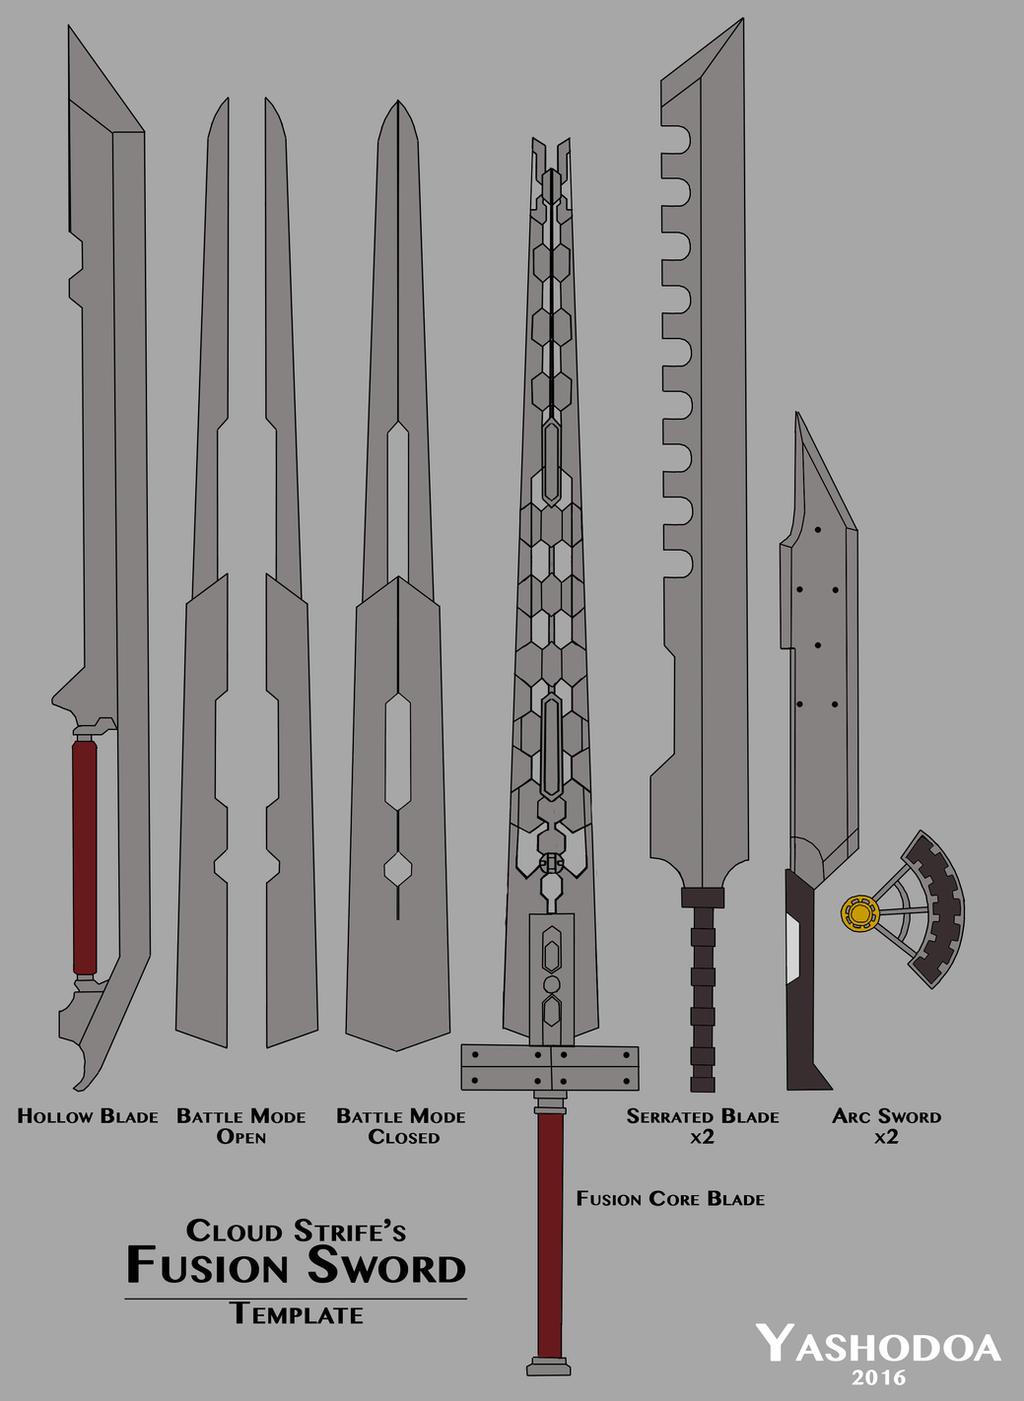 Fusion Sword Template By Yashodoa On Deviantart